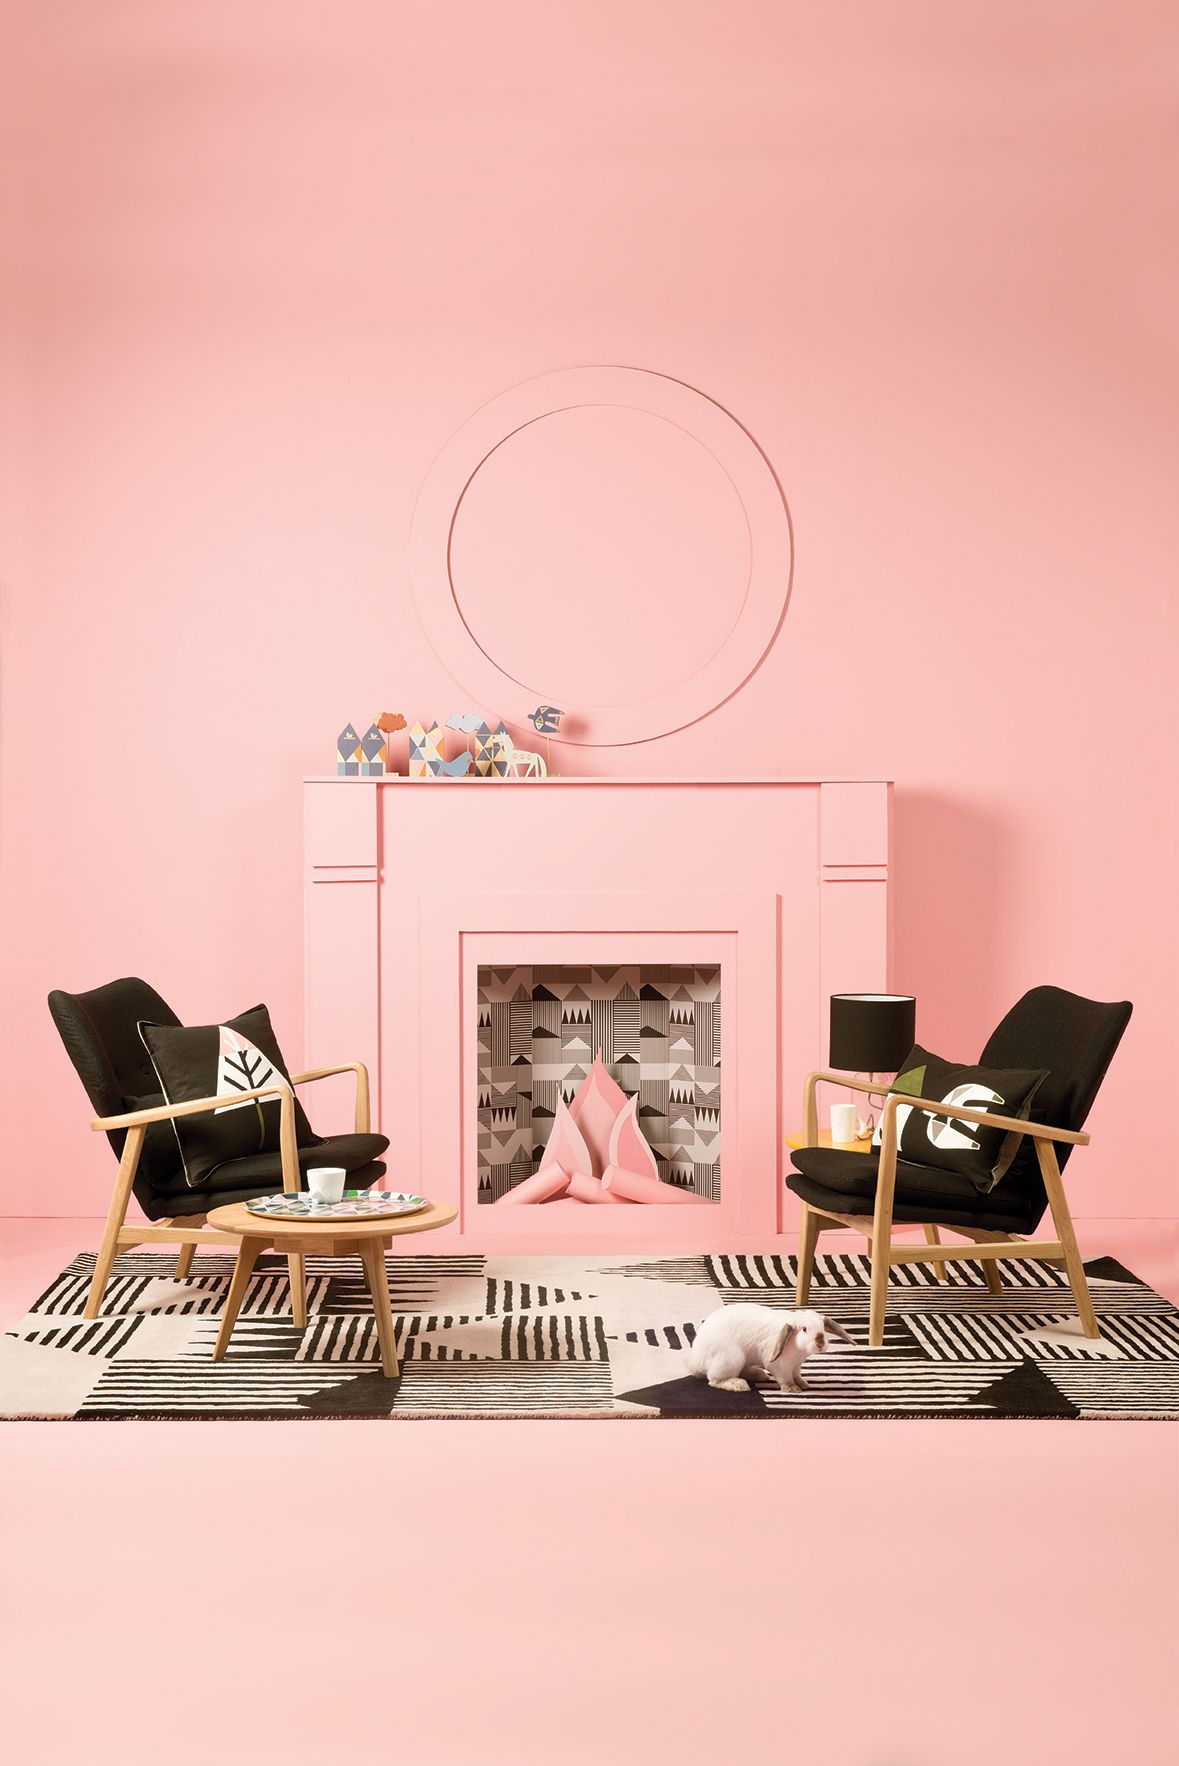 #Copenhagen #winter2014 #cosyuptowinter #CittaDesign #homeware #interiors #livingroom